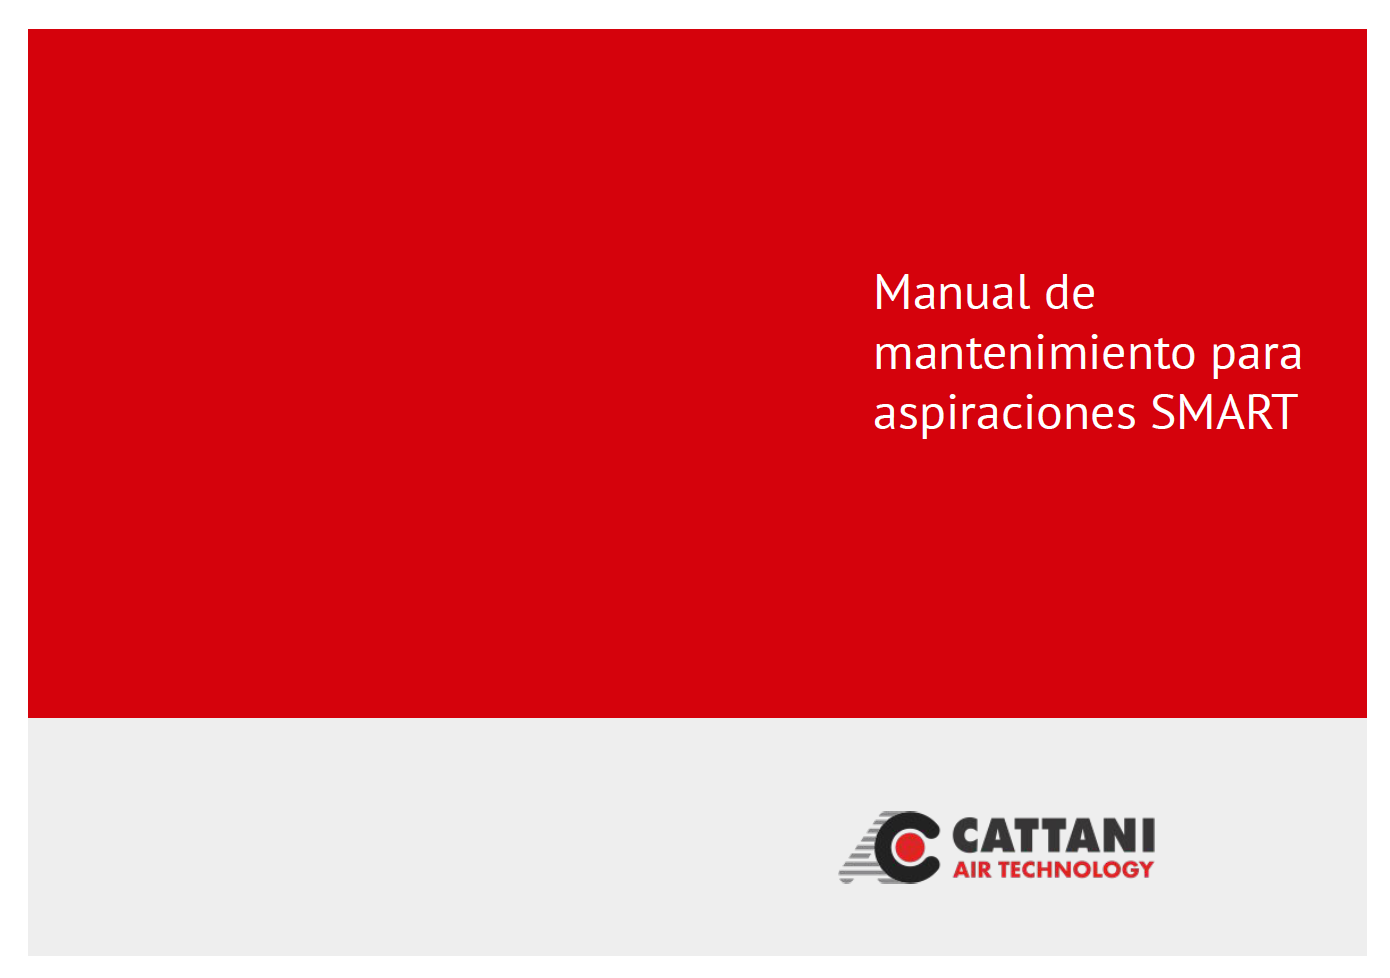 mantenimienti-aspiraciones-cattani.png